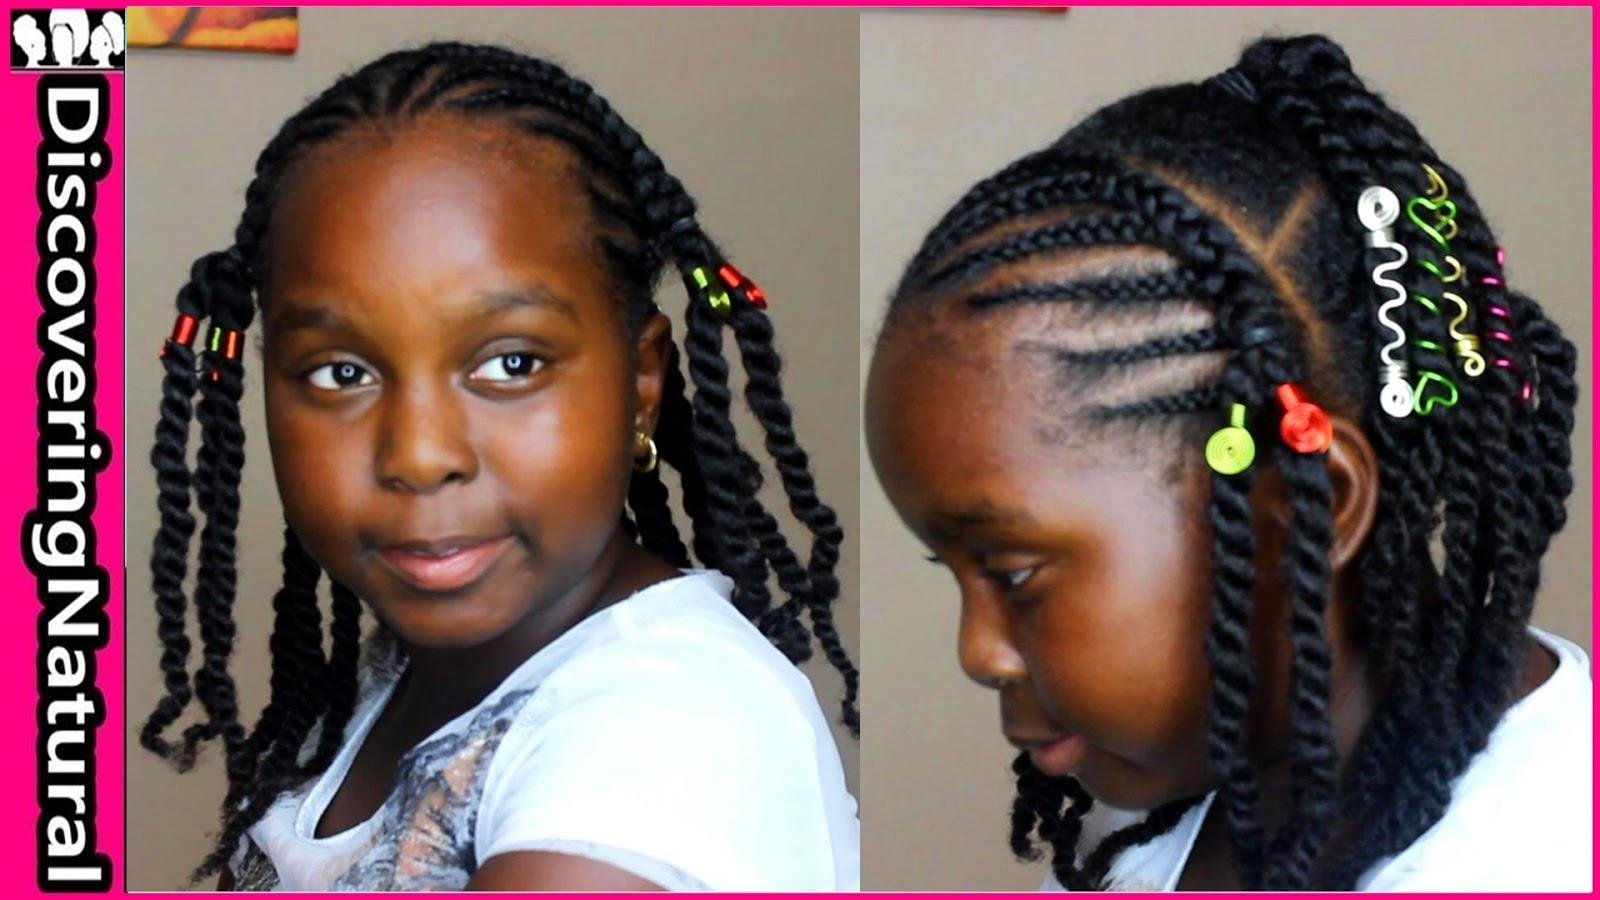 Discoveringnatural Kids Hairstyles Braids Natural Hair